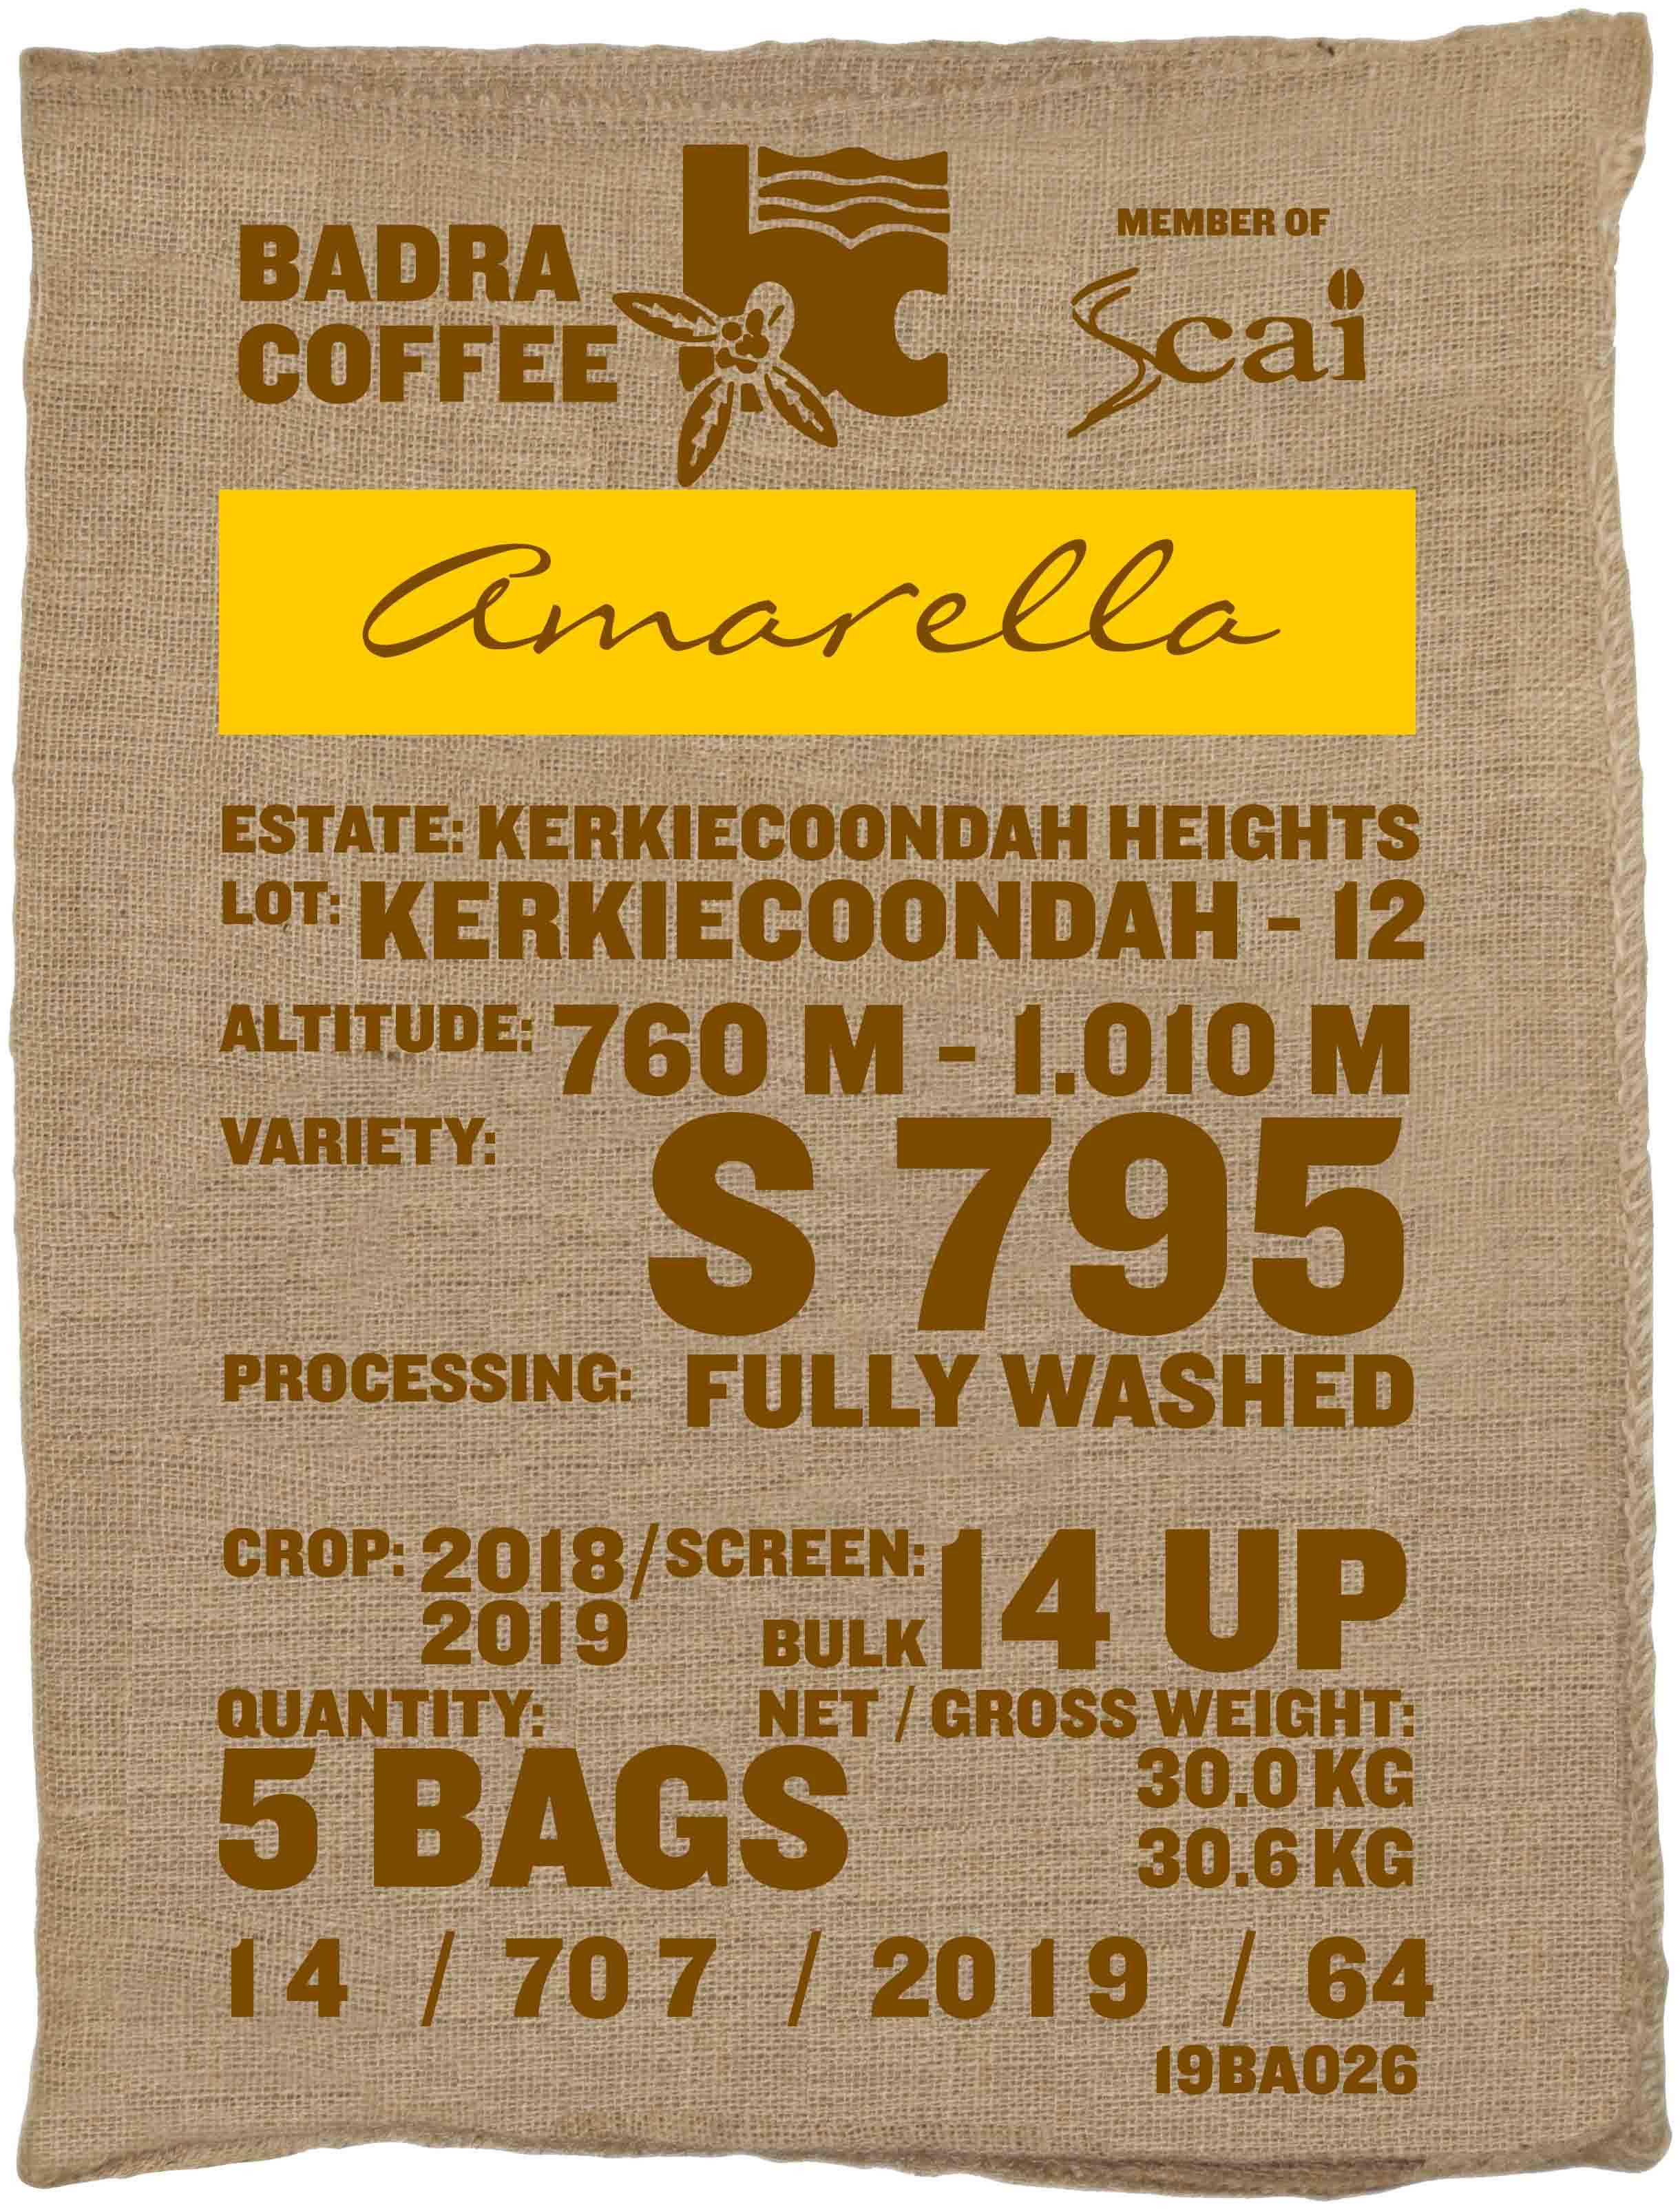 Ein Rohkaffeesack amarella Parzellenkaffee Varietät S795. Badra Estates Lot Kerkiecoondah 12.